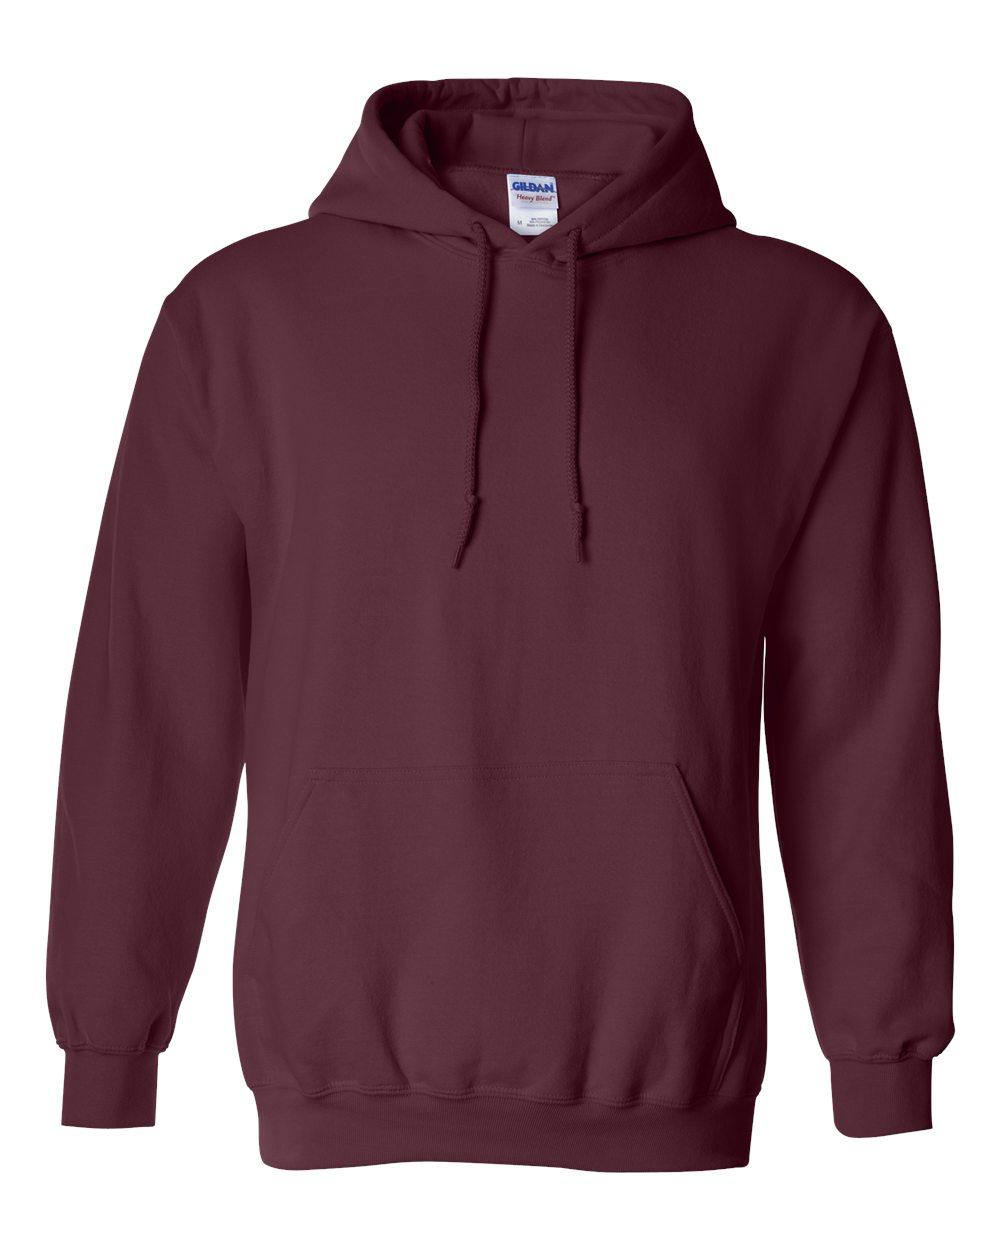 Gildan-Mens-Blank-Hoodie-Heavy-Blend-Hooded-Sweatshirt-Solid-18500-up-to-5XL thumbnail 56